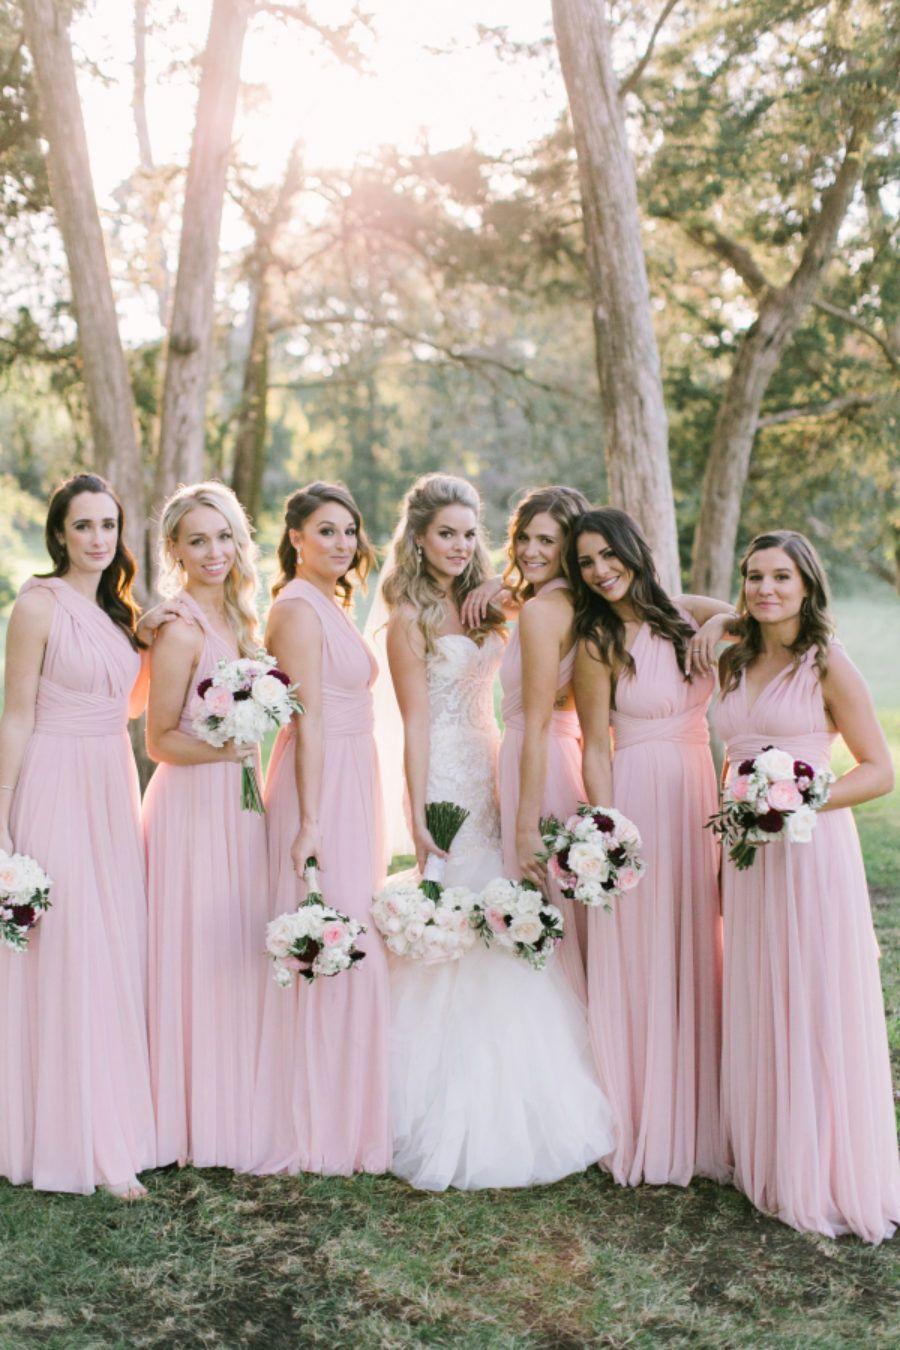 Nikki ferrells beautiful bridesmaids looked gorgeous in our petal nikki ferrells beautiful bridesmaids looked gorgeous in our petal tulle ballgown twobirds bridesmaid multiway ombrellifo Images